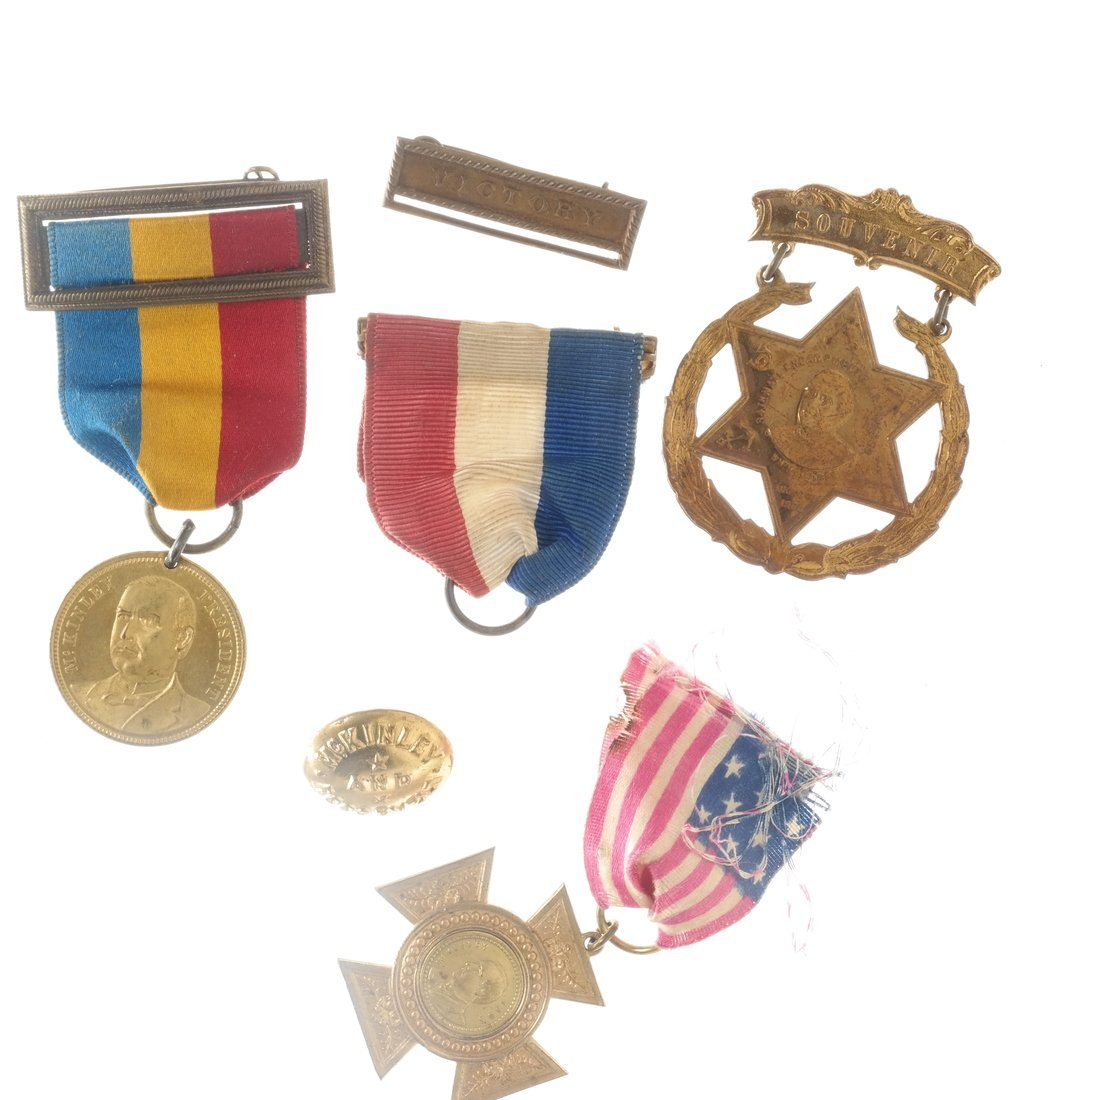 William McKinley - Campaign and Memorial Items - 4